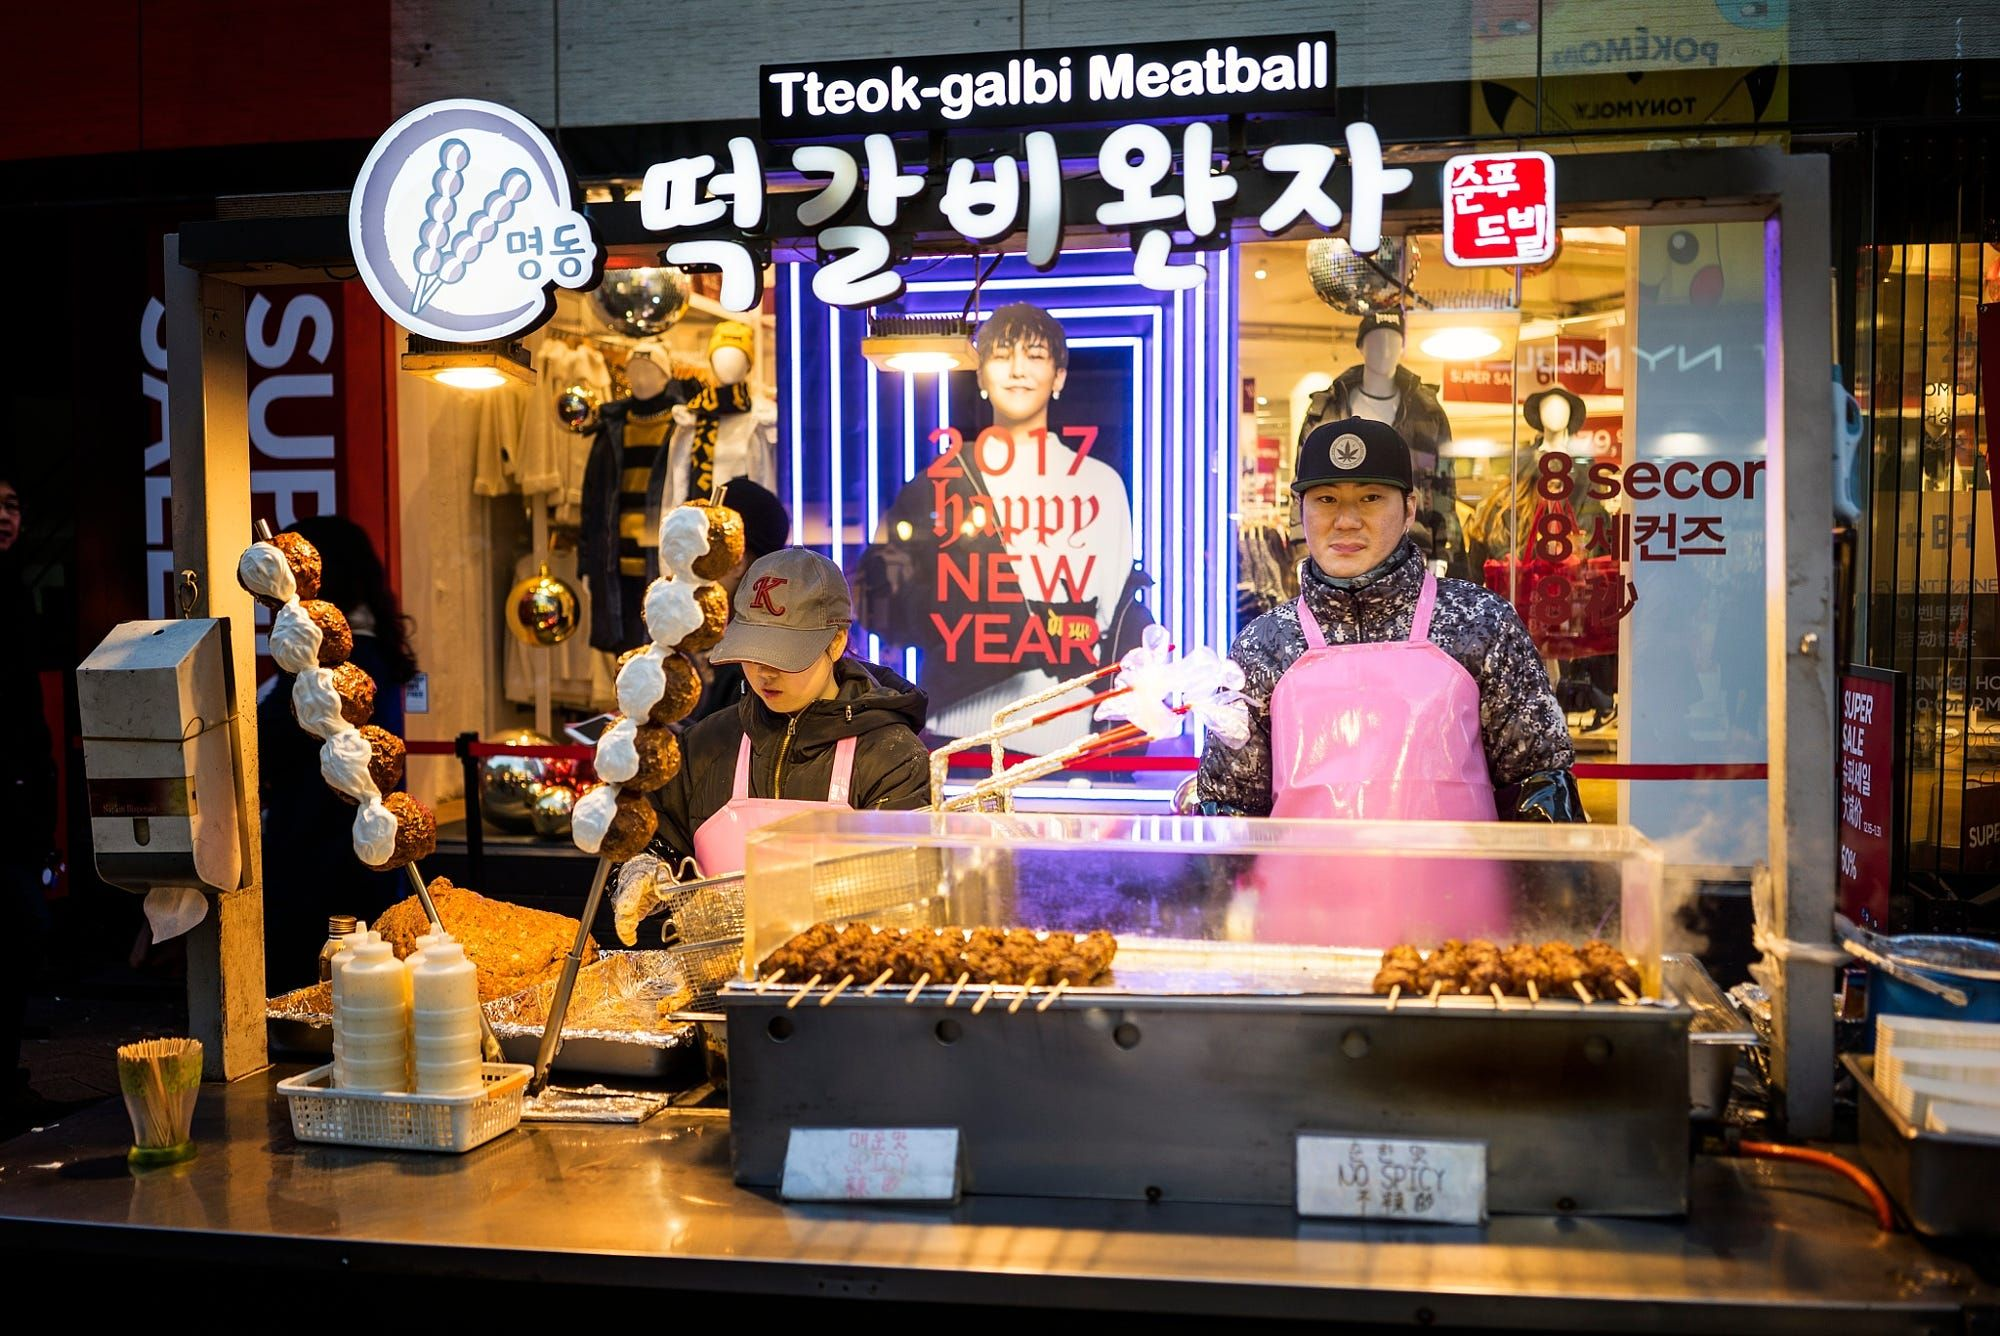 Street Photography : Korean Meatball by edlim https://t.co/zJovlepqt7 | #streets #photography #photos #500px https://t.co/Pwm3AHTwPV #fol #photography